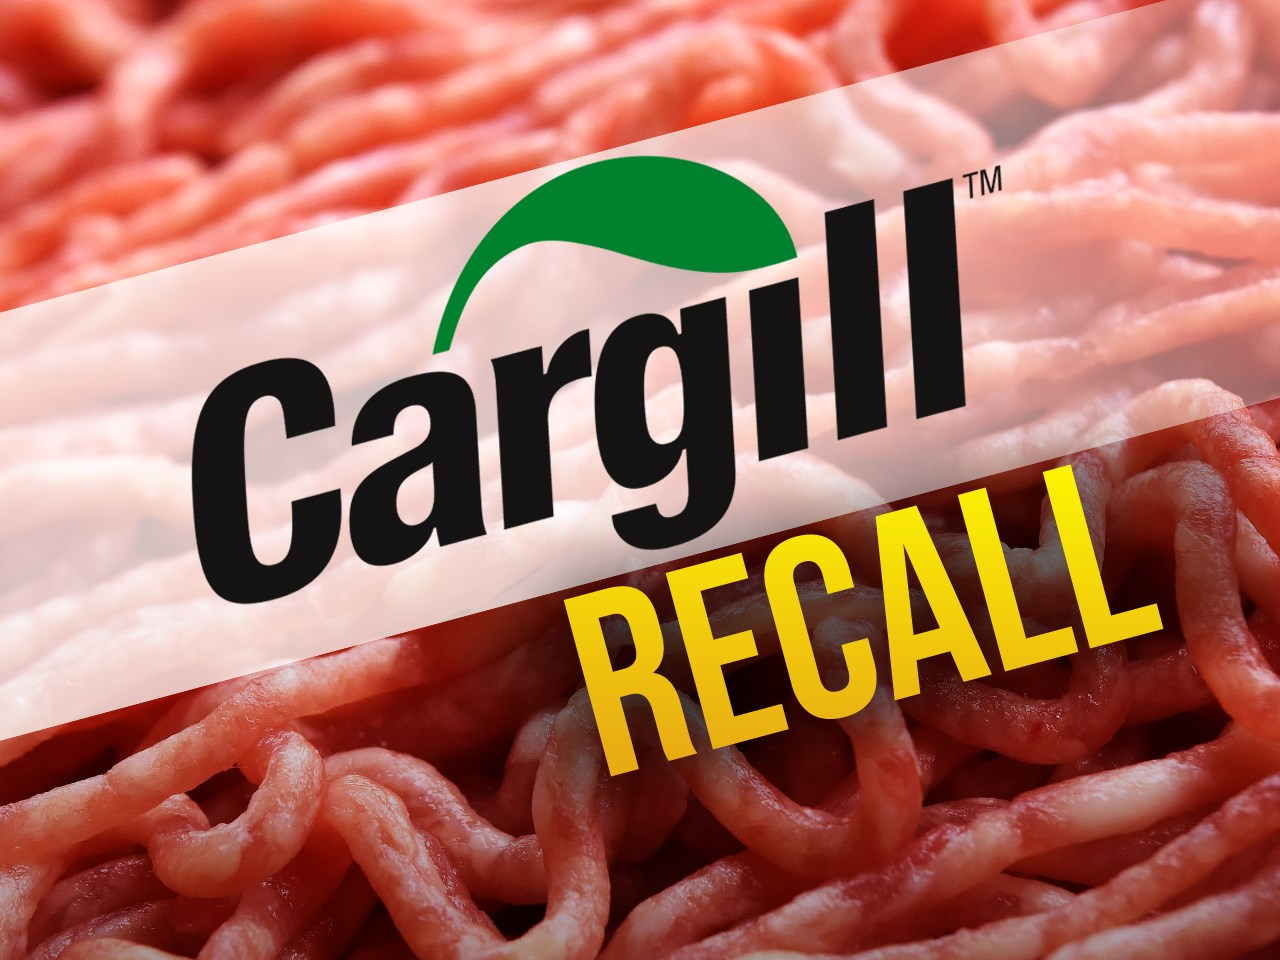 Cargill beef recall